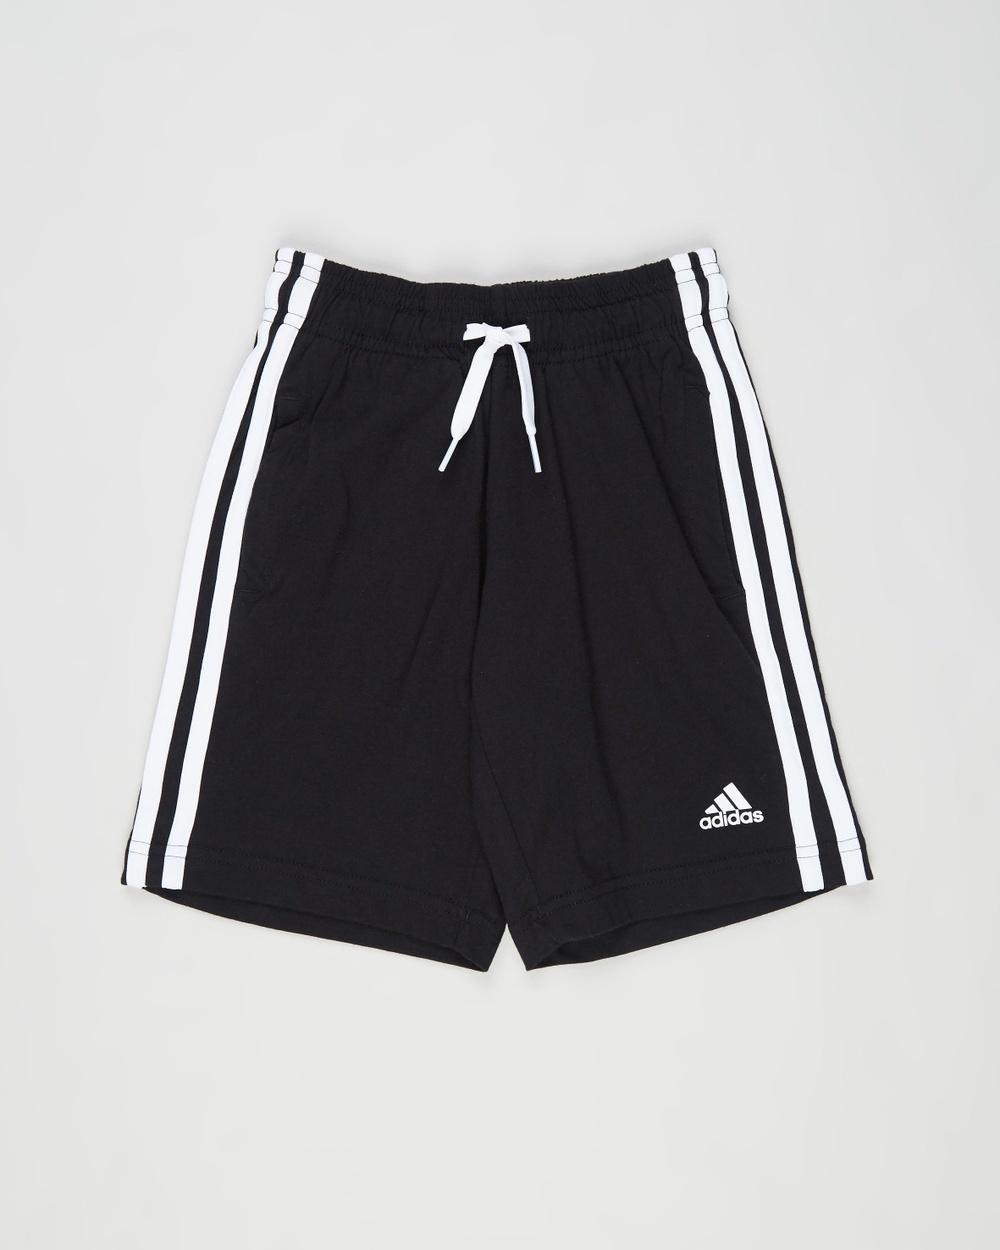 adidas Performance Essentials 3 Stripes Cotton Shorts Kids Teens High-Waisted Black & White 3-Stripes Kids-Teens